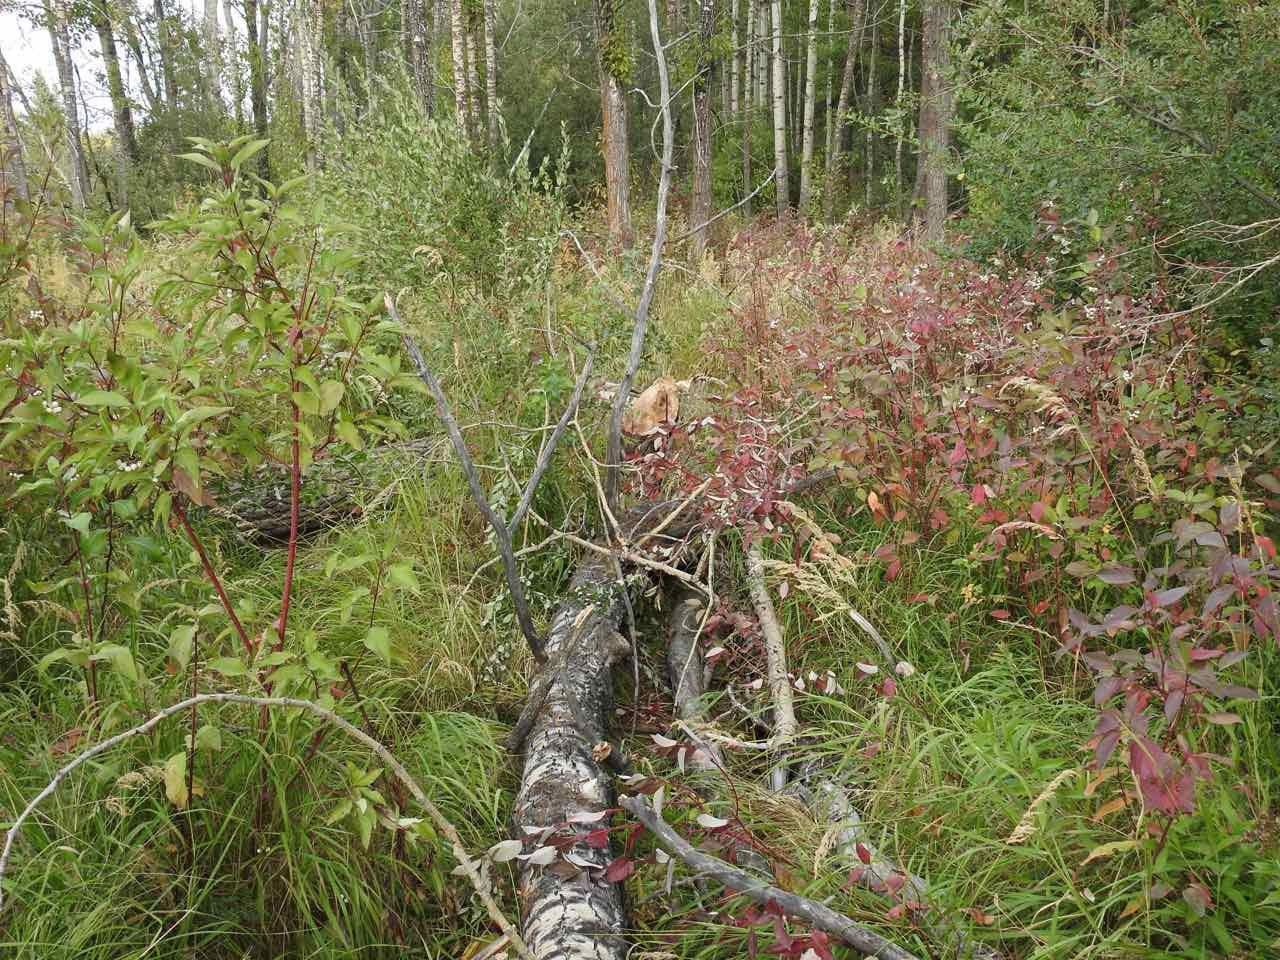 -Beaver_Pond-East_End-Beaver_Seeking_To_Dam_Further_Upstream_On_WC01-Tree_Fall_B1_Sept_16_2017.jpg